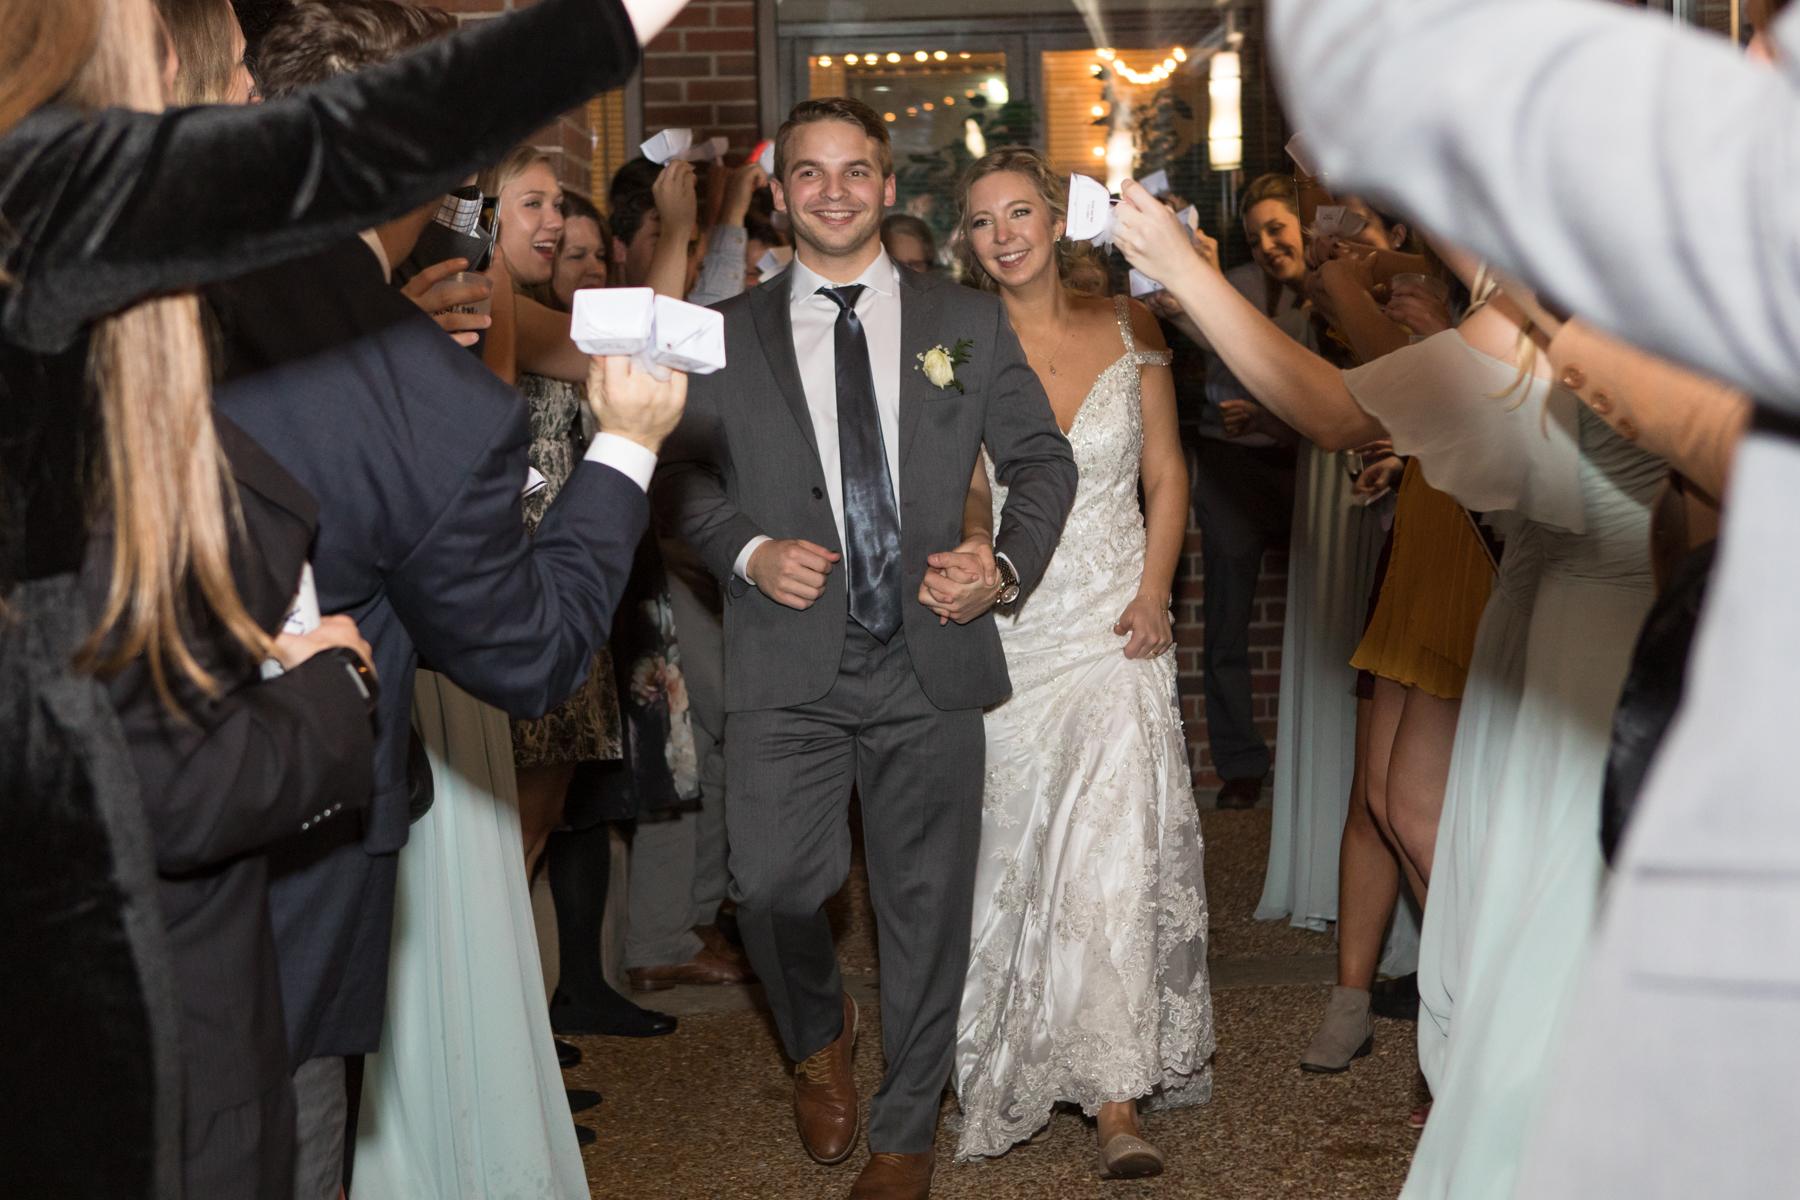 Kelli-and-Matt-Nashville-Wedding-Sneak-Peak-0323.jpg